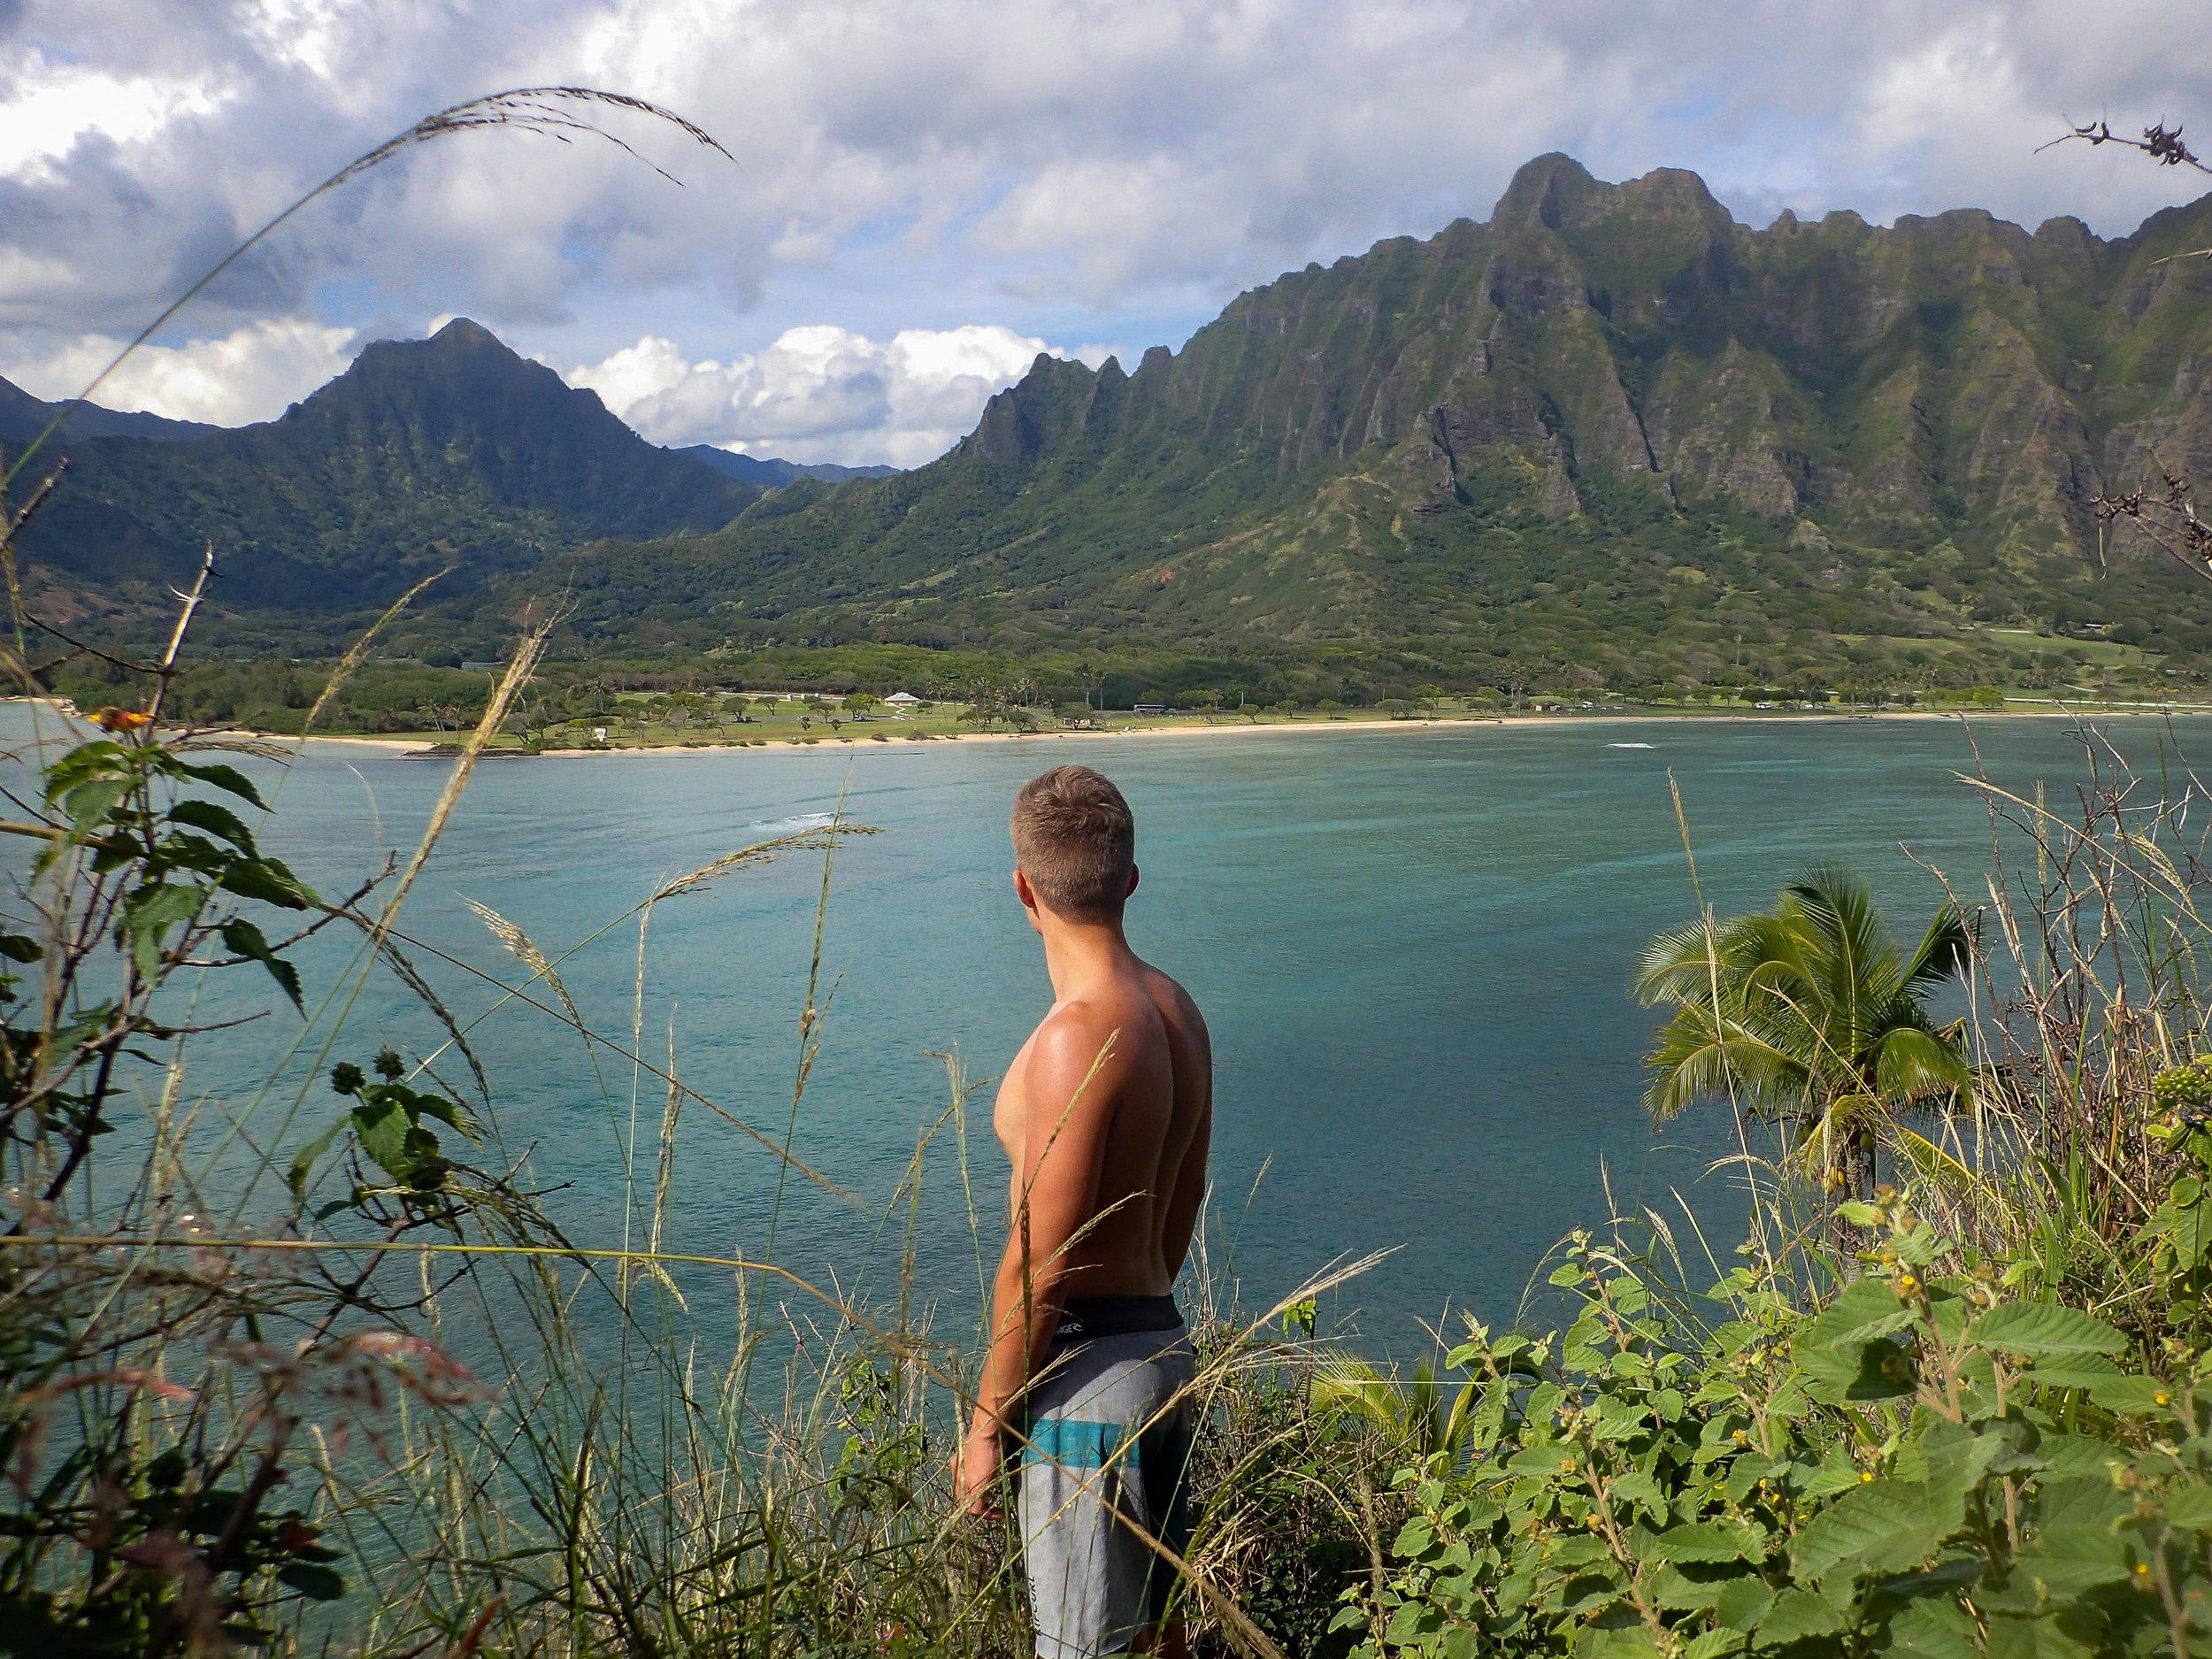 P_Tr_HI_Oahu_Olympus Images-396.jpg